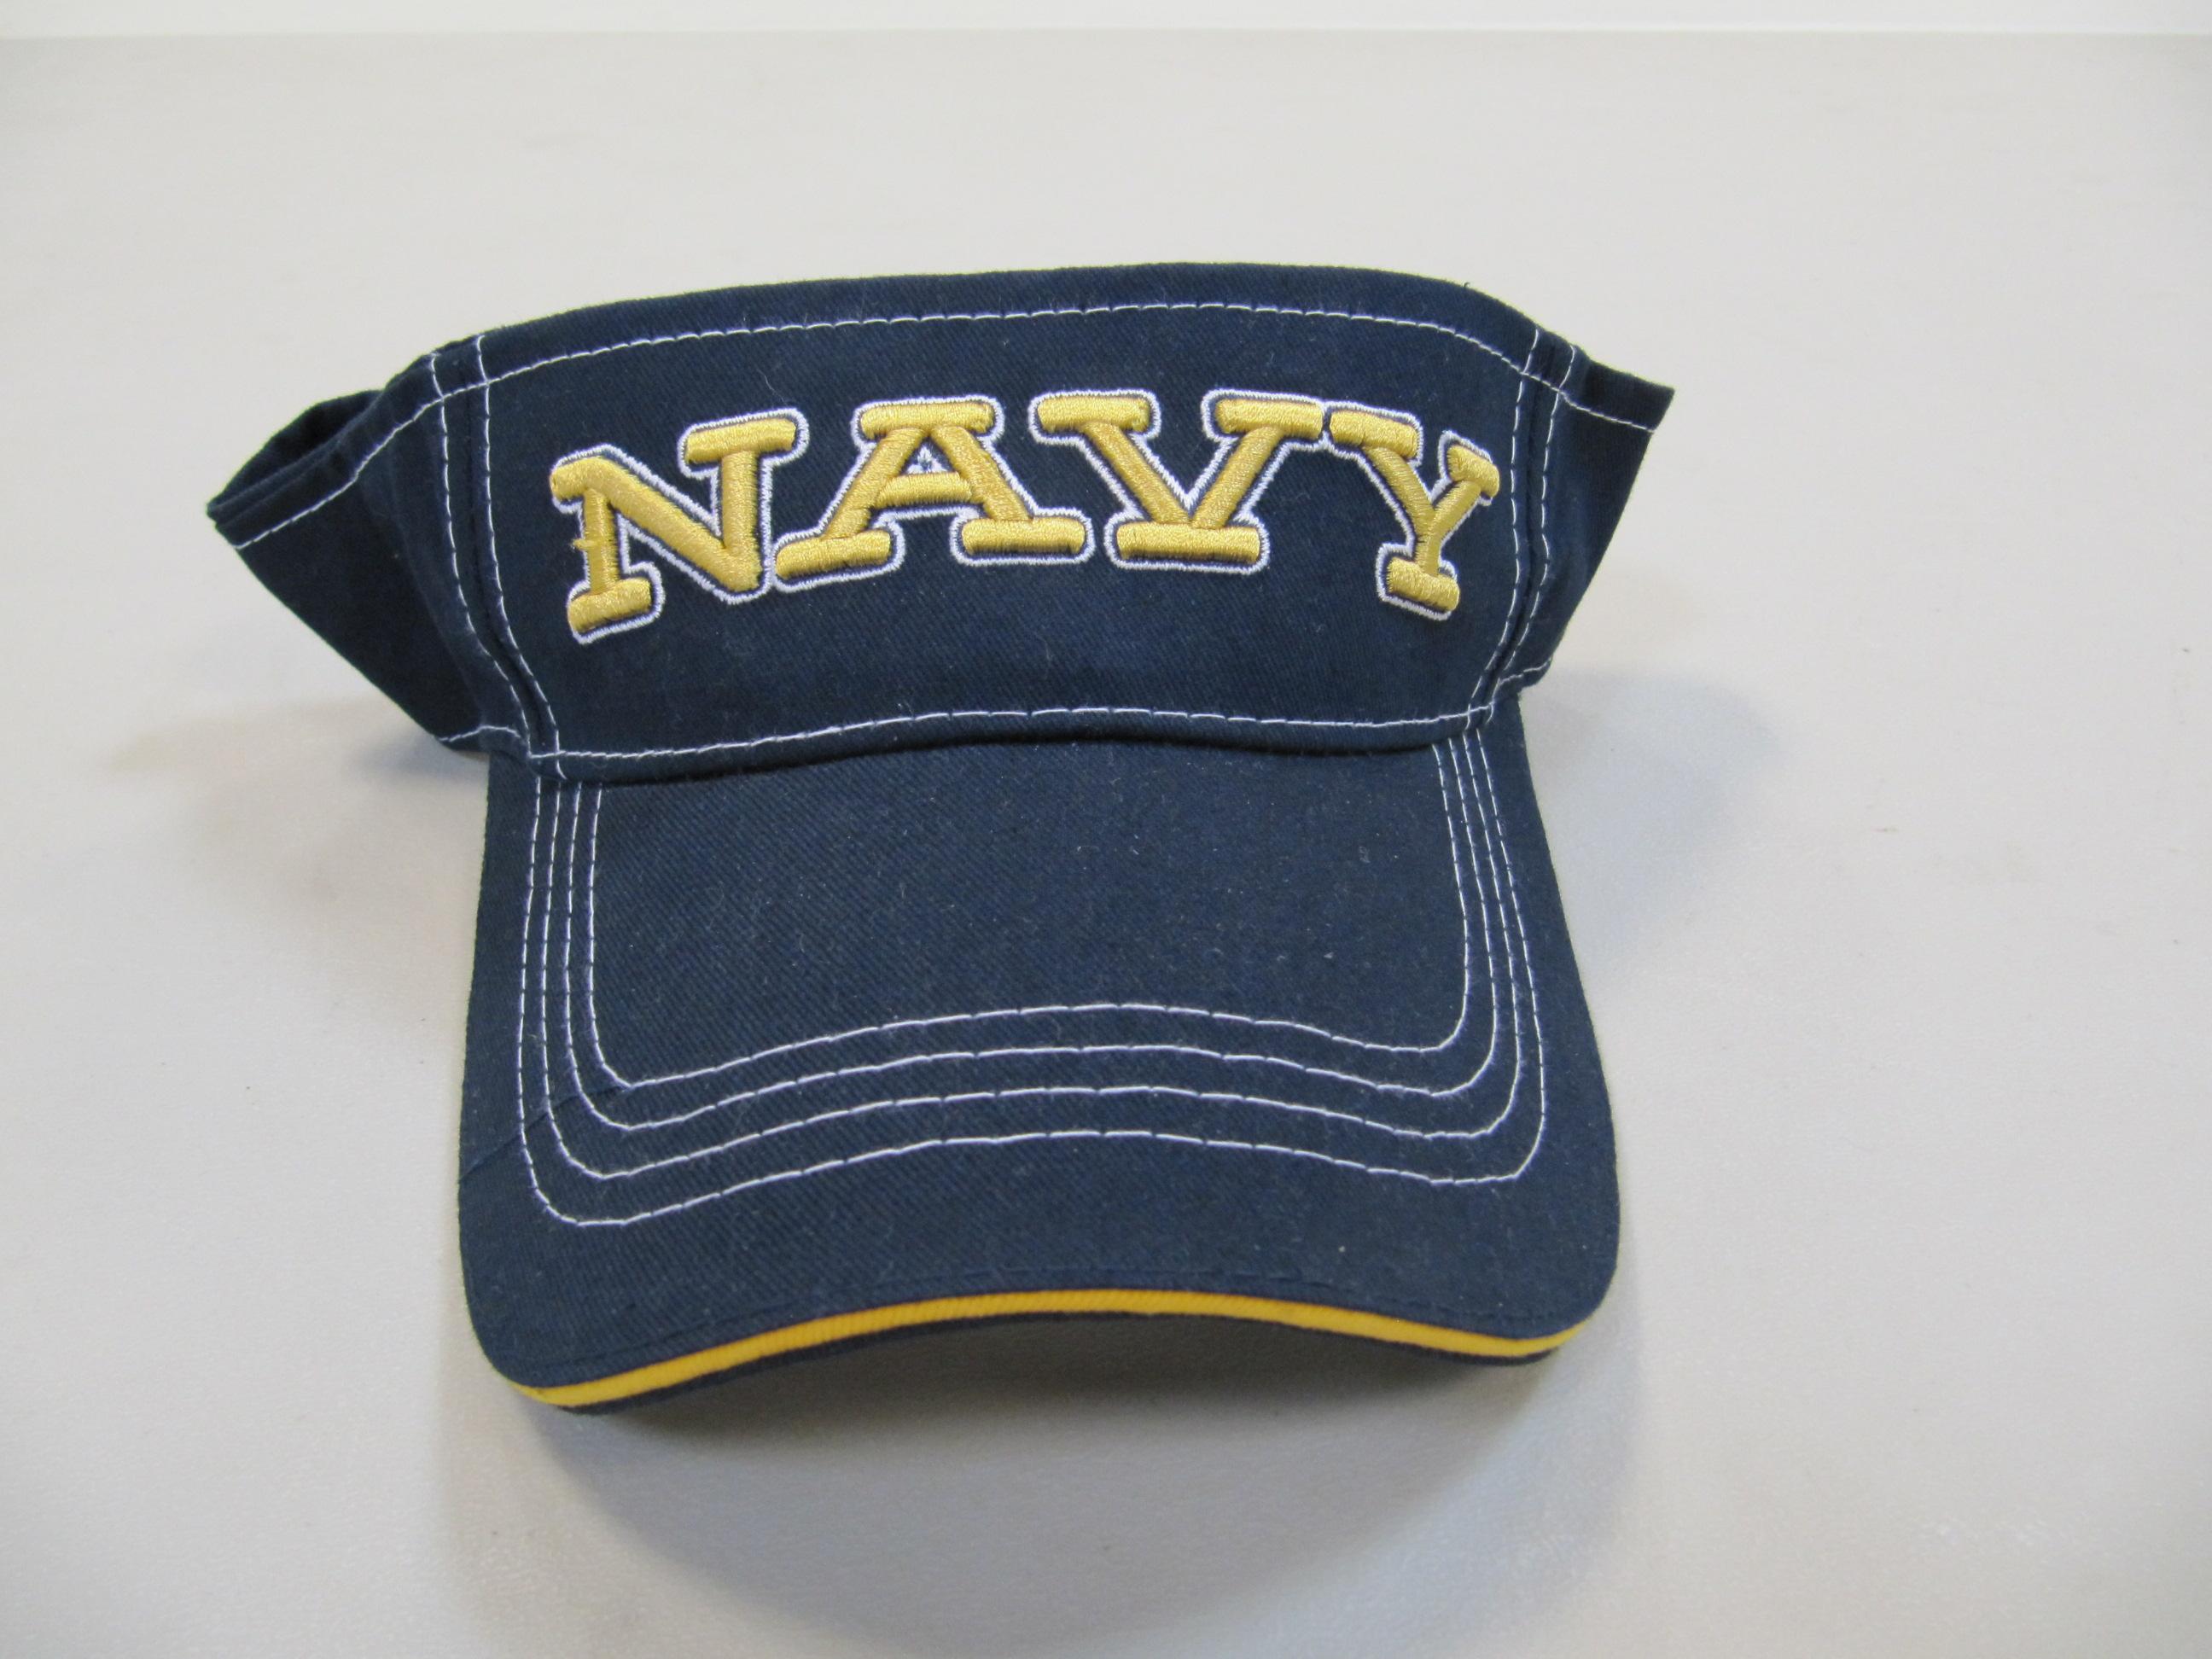 Navy Hats - Shop | New Jersey Vietnam Veterans' Memorial Foundation